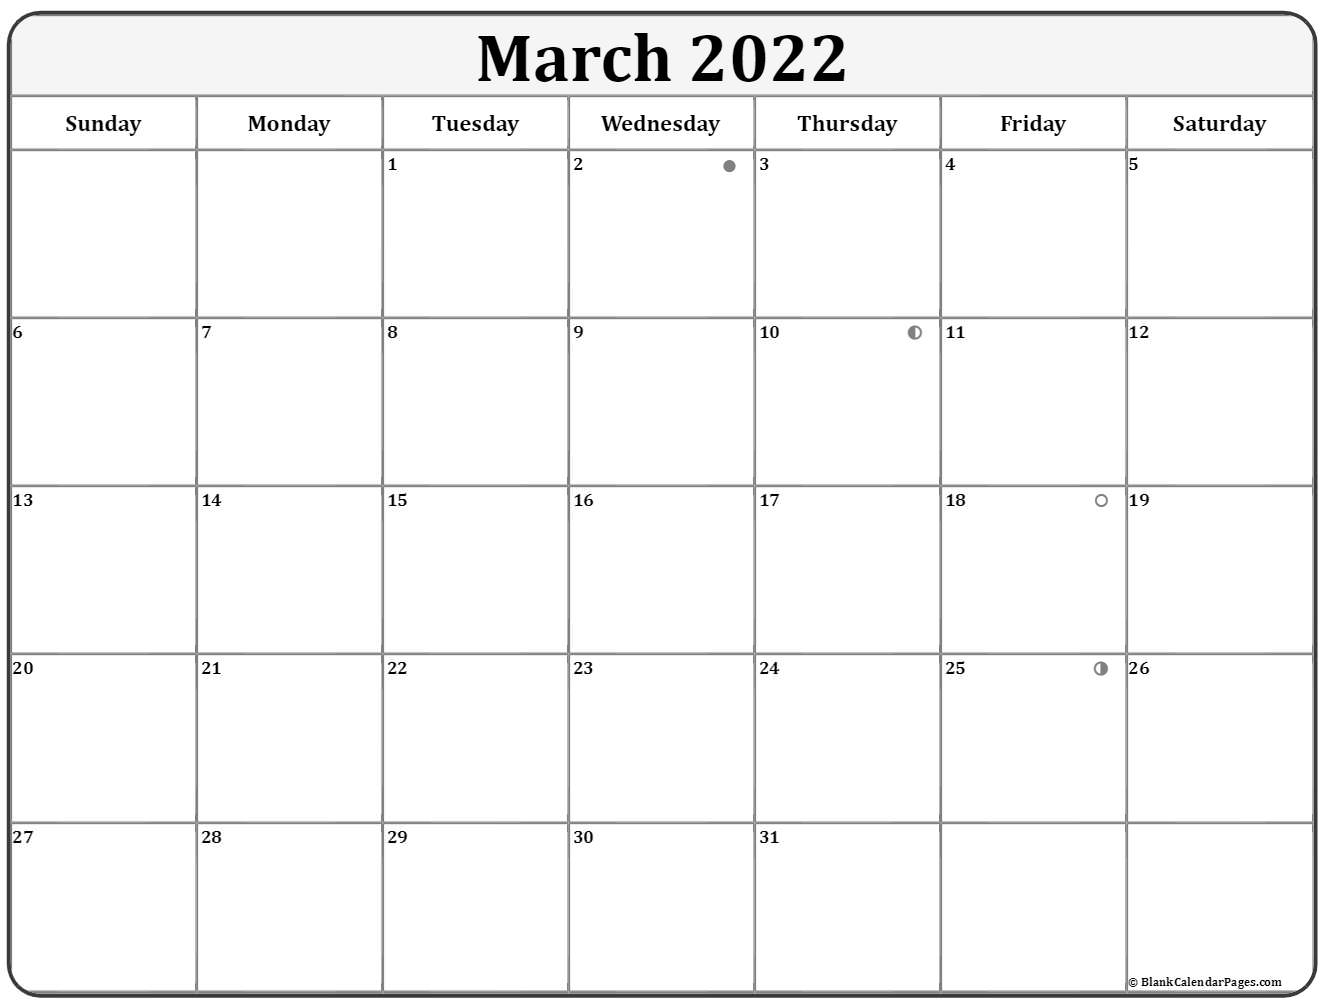 March Lunar Calendar